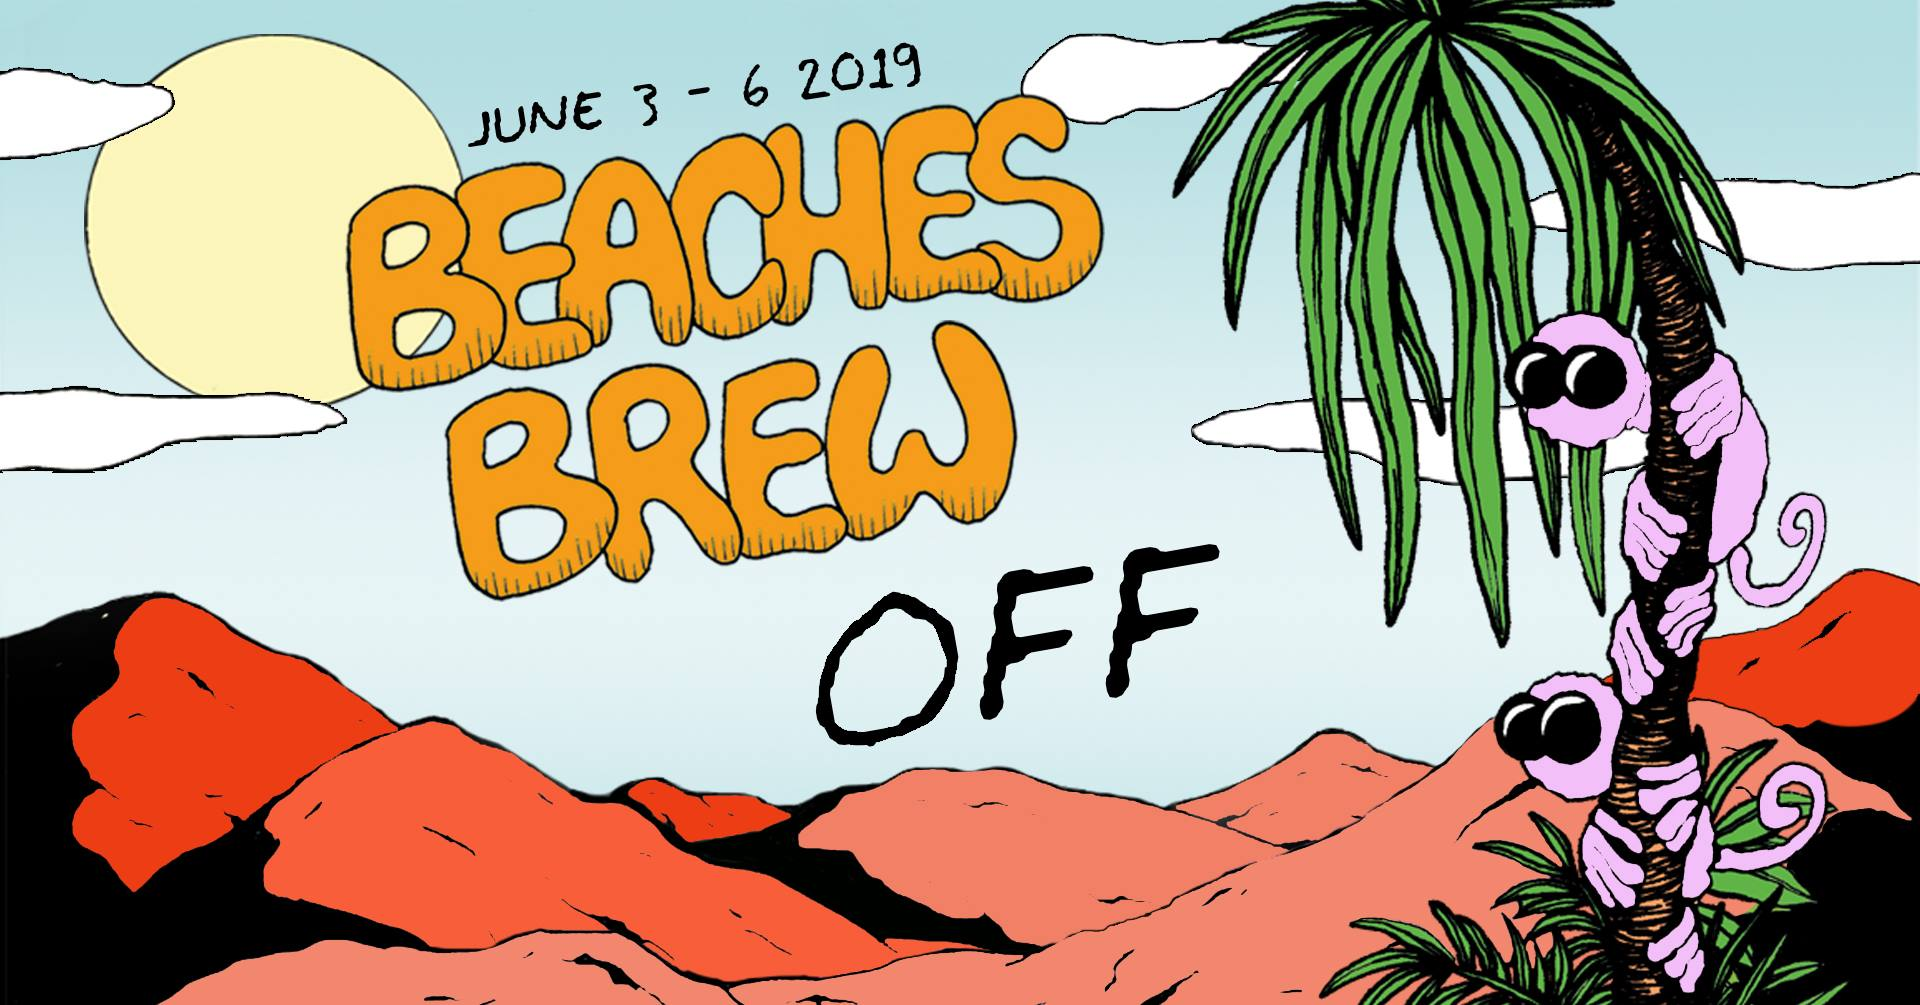 Beaches Brew Off